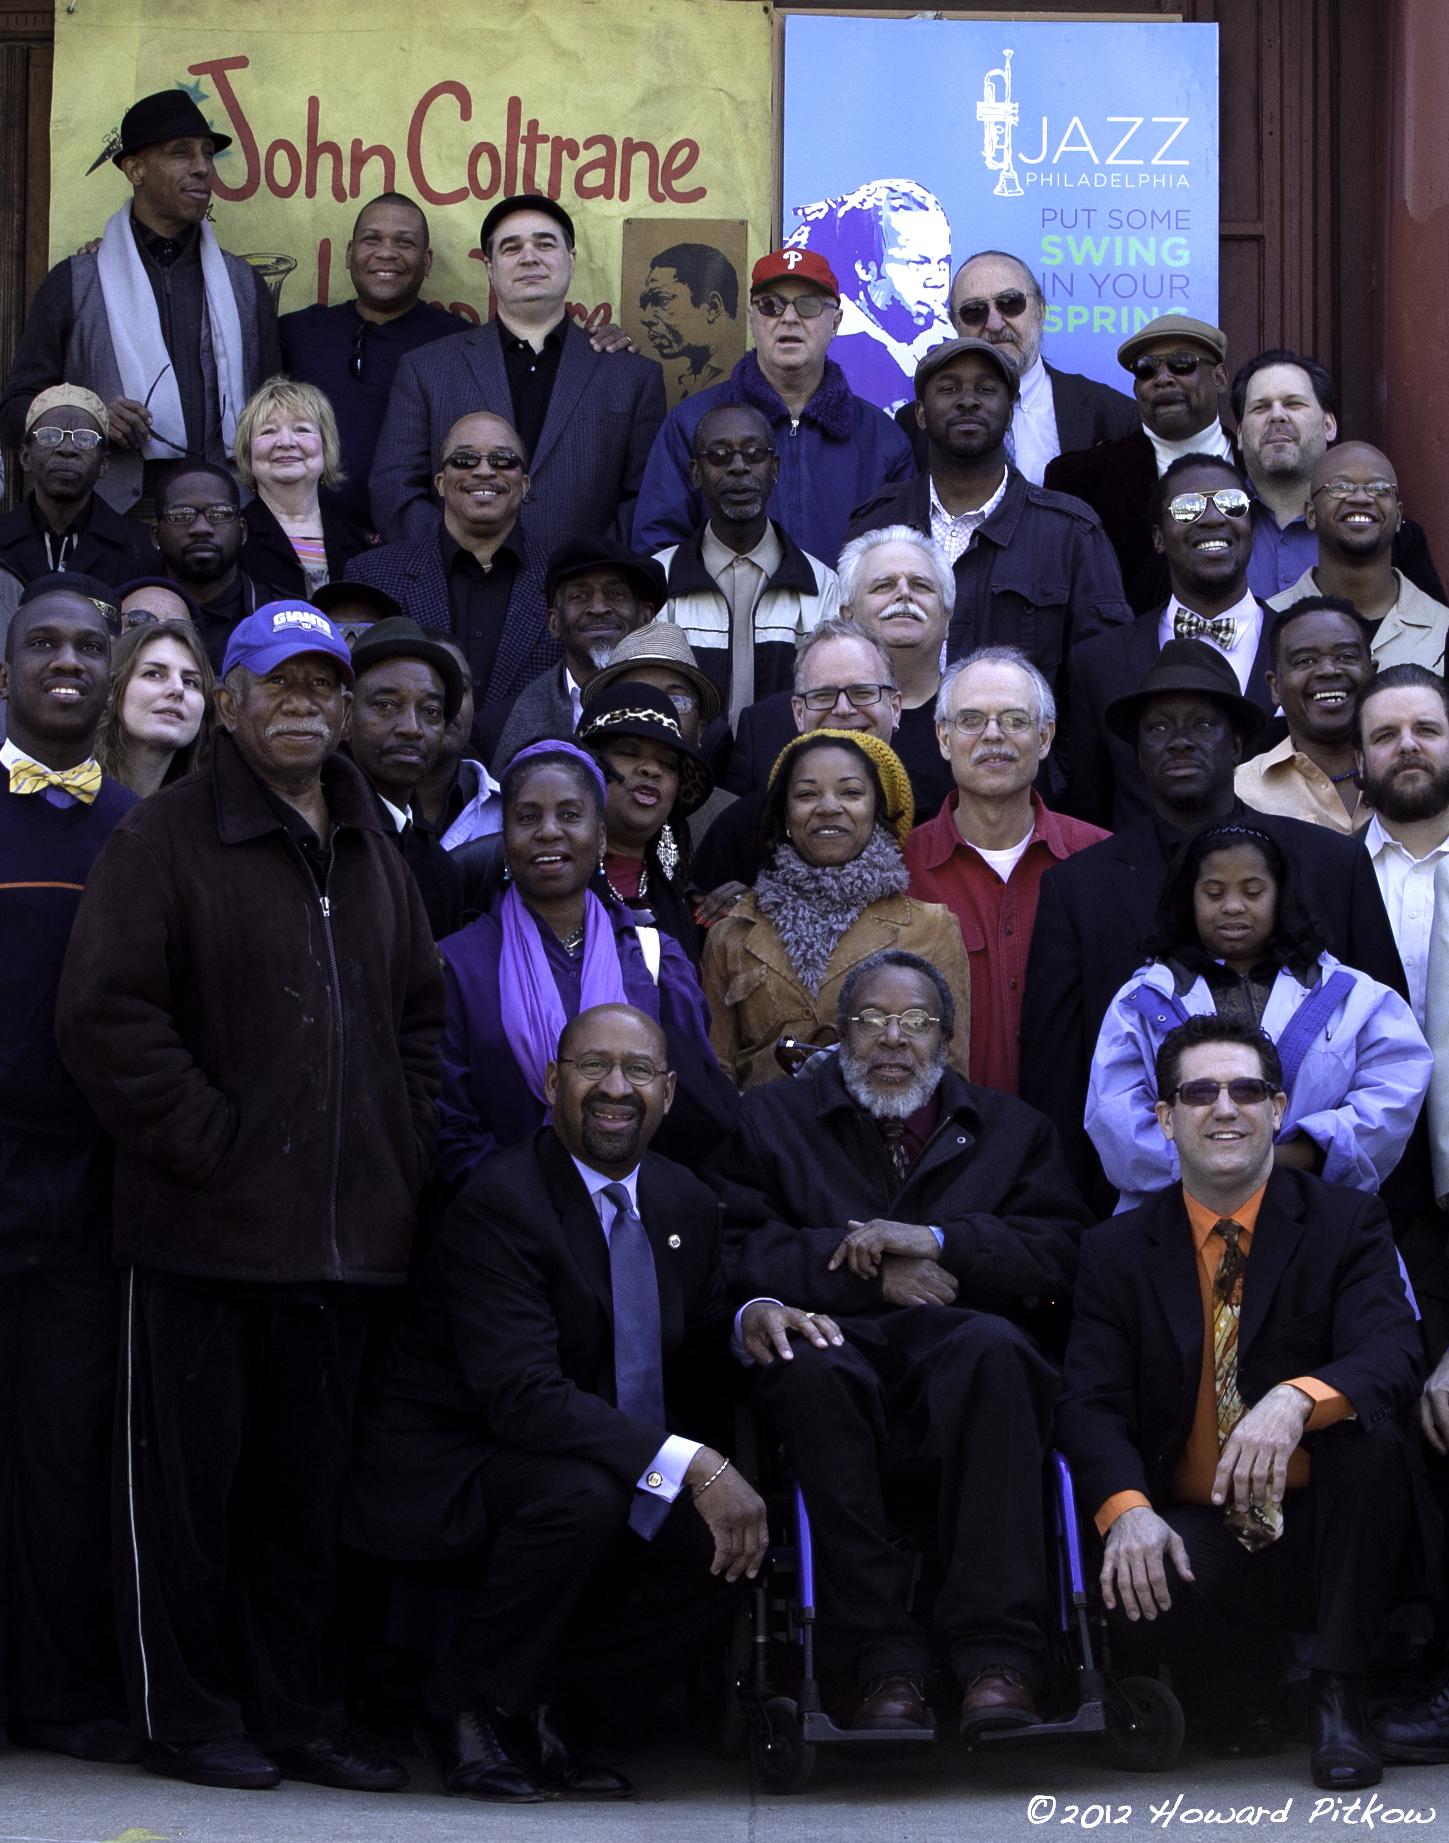 2012 Musician Photo Shoot at the John Coltrane Home.